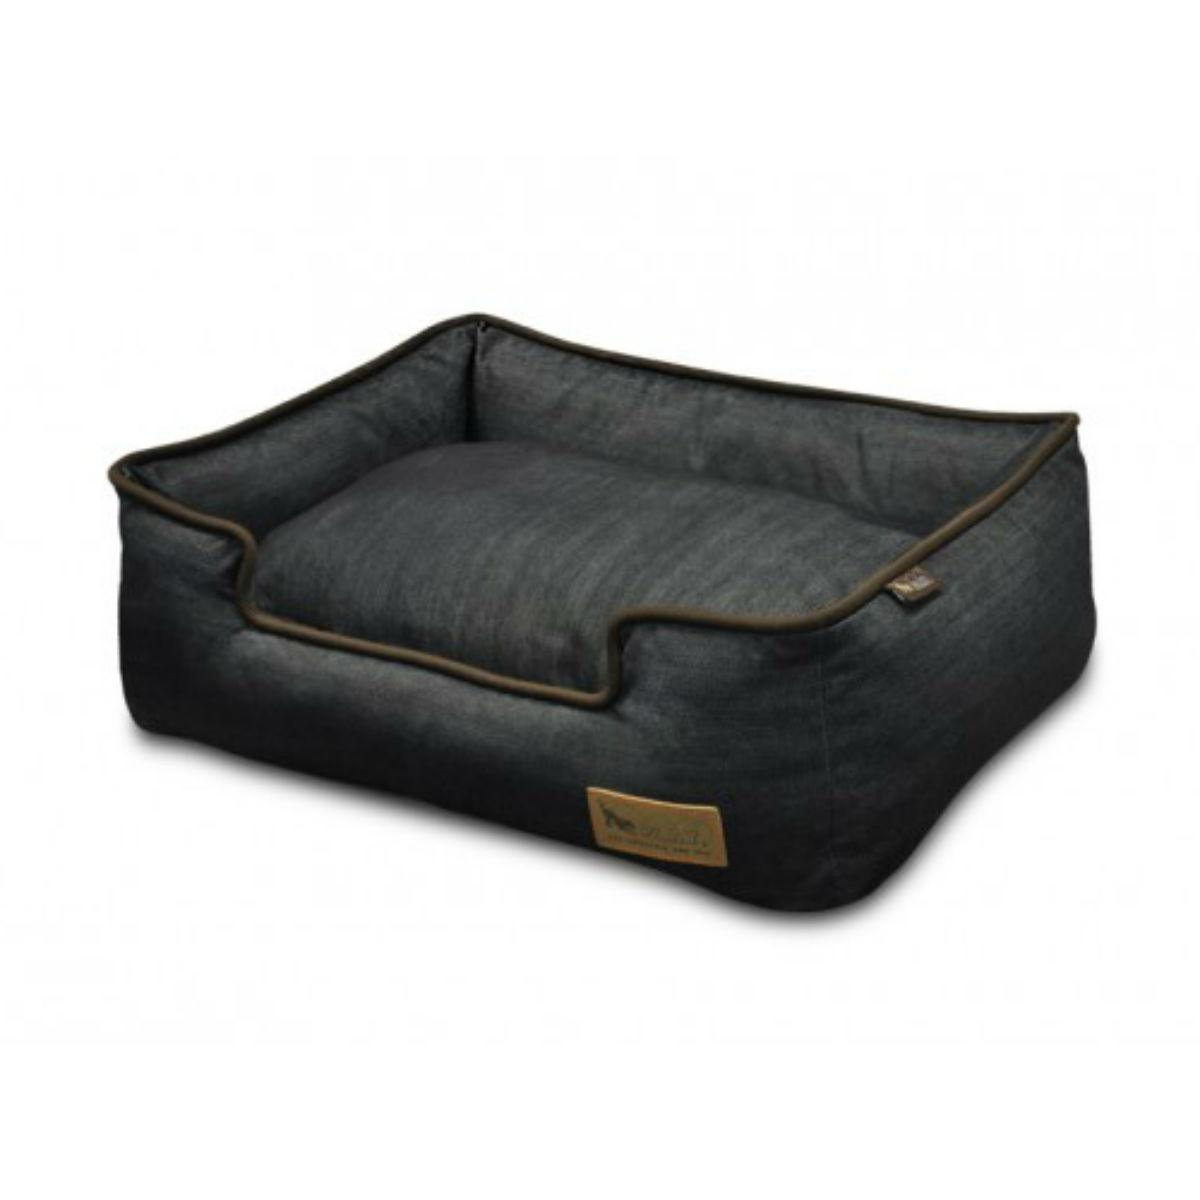 P.L.A.Y. Urban Denim Lounge Dog Bed - Medieval Blue and Dark Chocolate